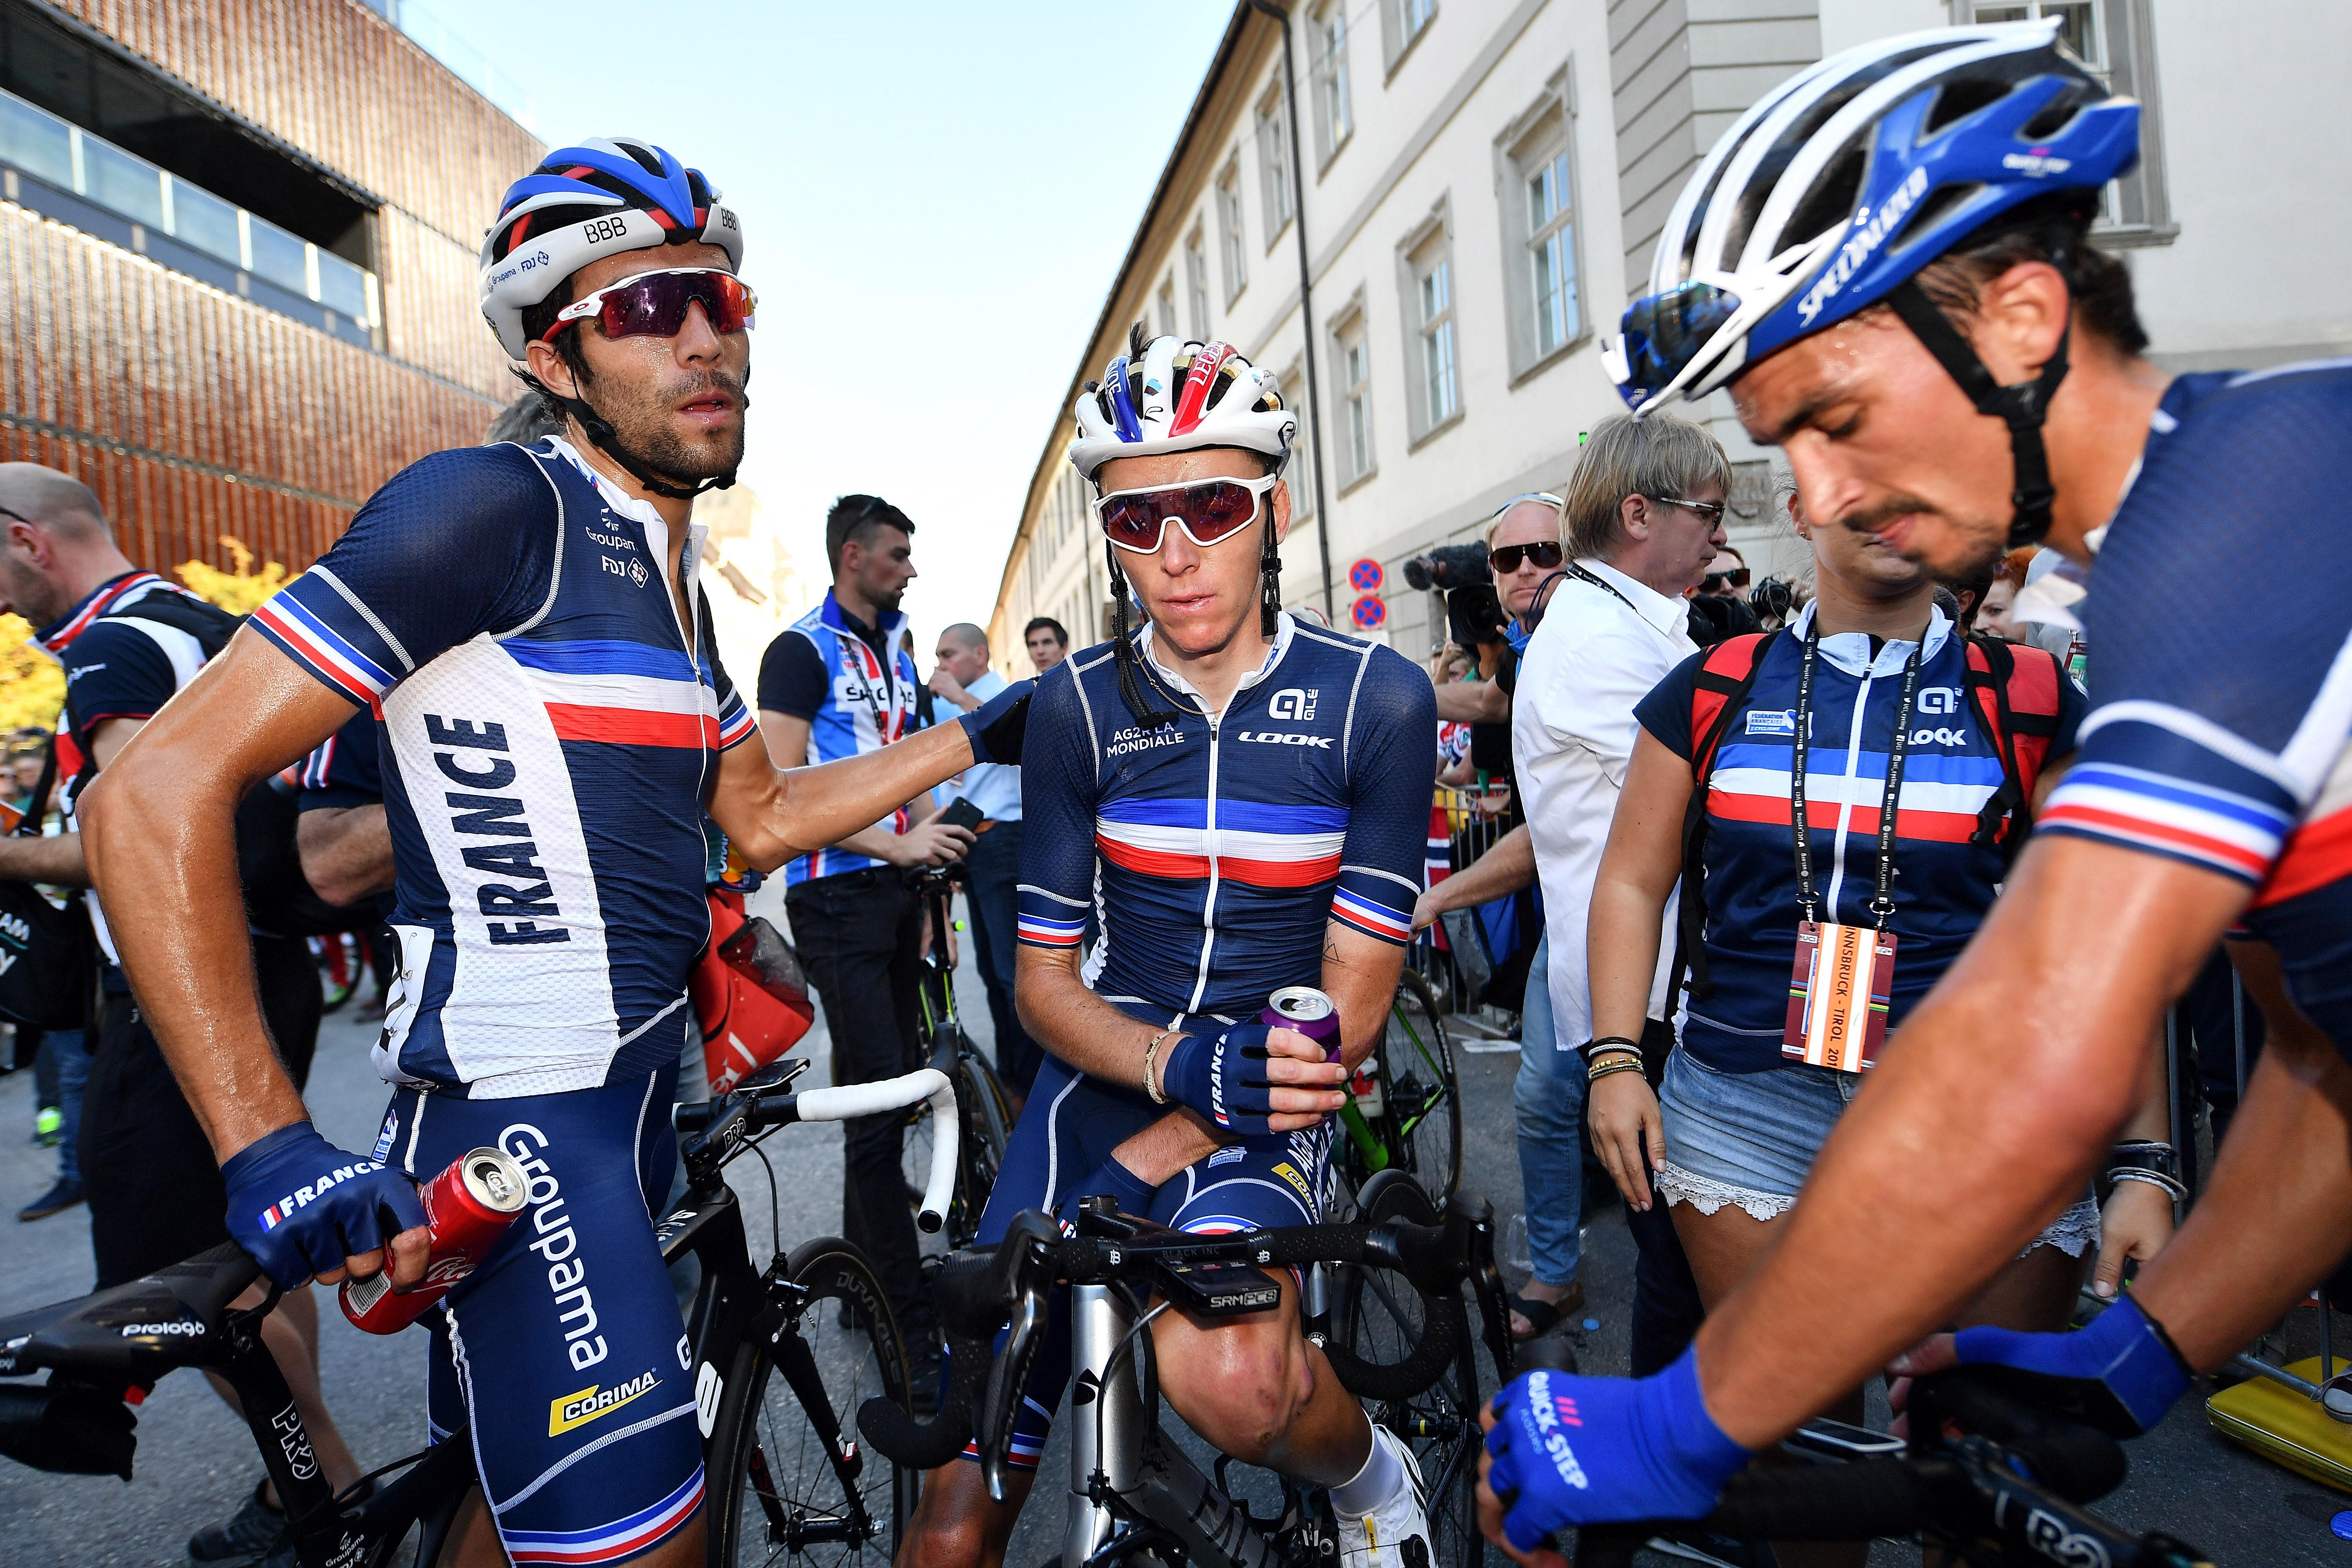 Thibaut Pinot, Romain Bardet et Julian Alaphilippe.